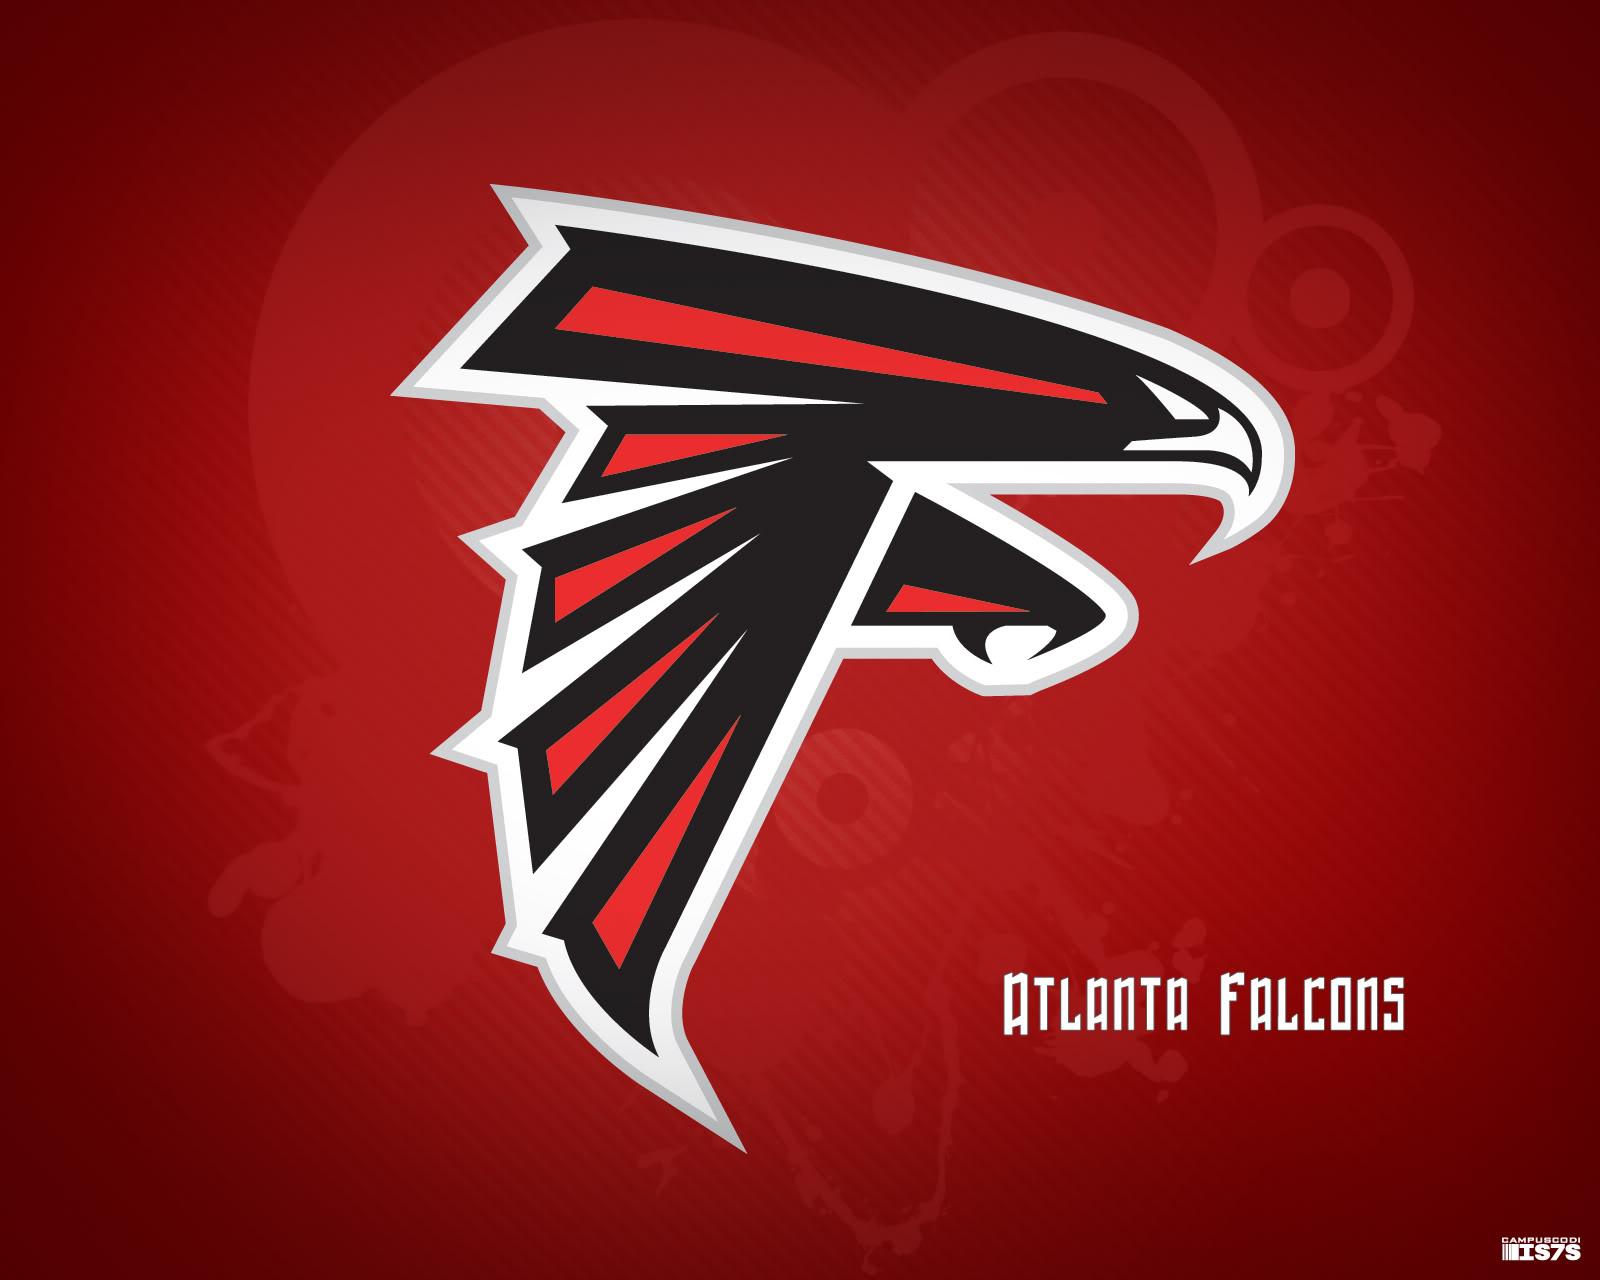 Atlanta Falcons Hd Wallpapers: ATLANTA FALCONS Nfl Football G Wallpaper